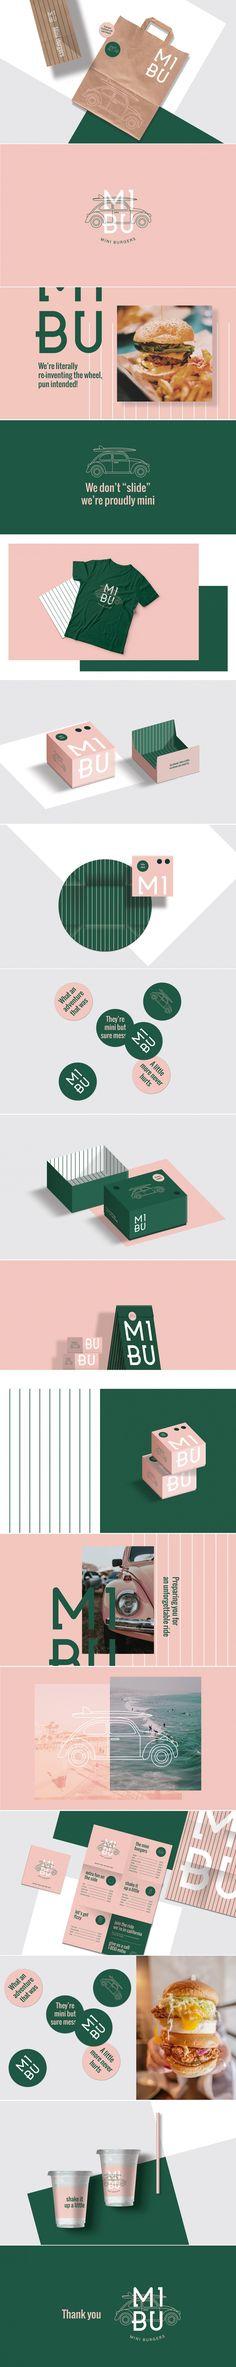 Mibu mini burgers restaurant brand identity by Studio AIO Brand Identity Design, Graphic Design Branding, Stationery Design, Corporate Design, Brochure Design, Logo Design, Branding And Packaging, Hotel Branding, Restaurant Branding